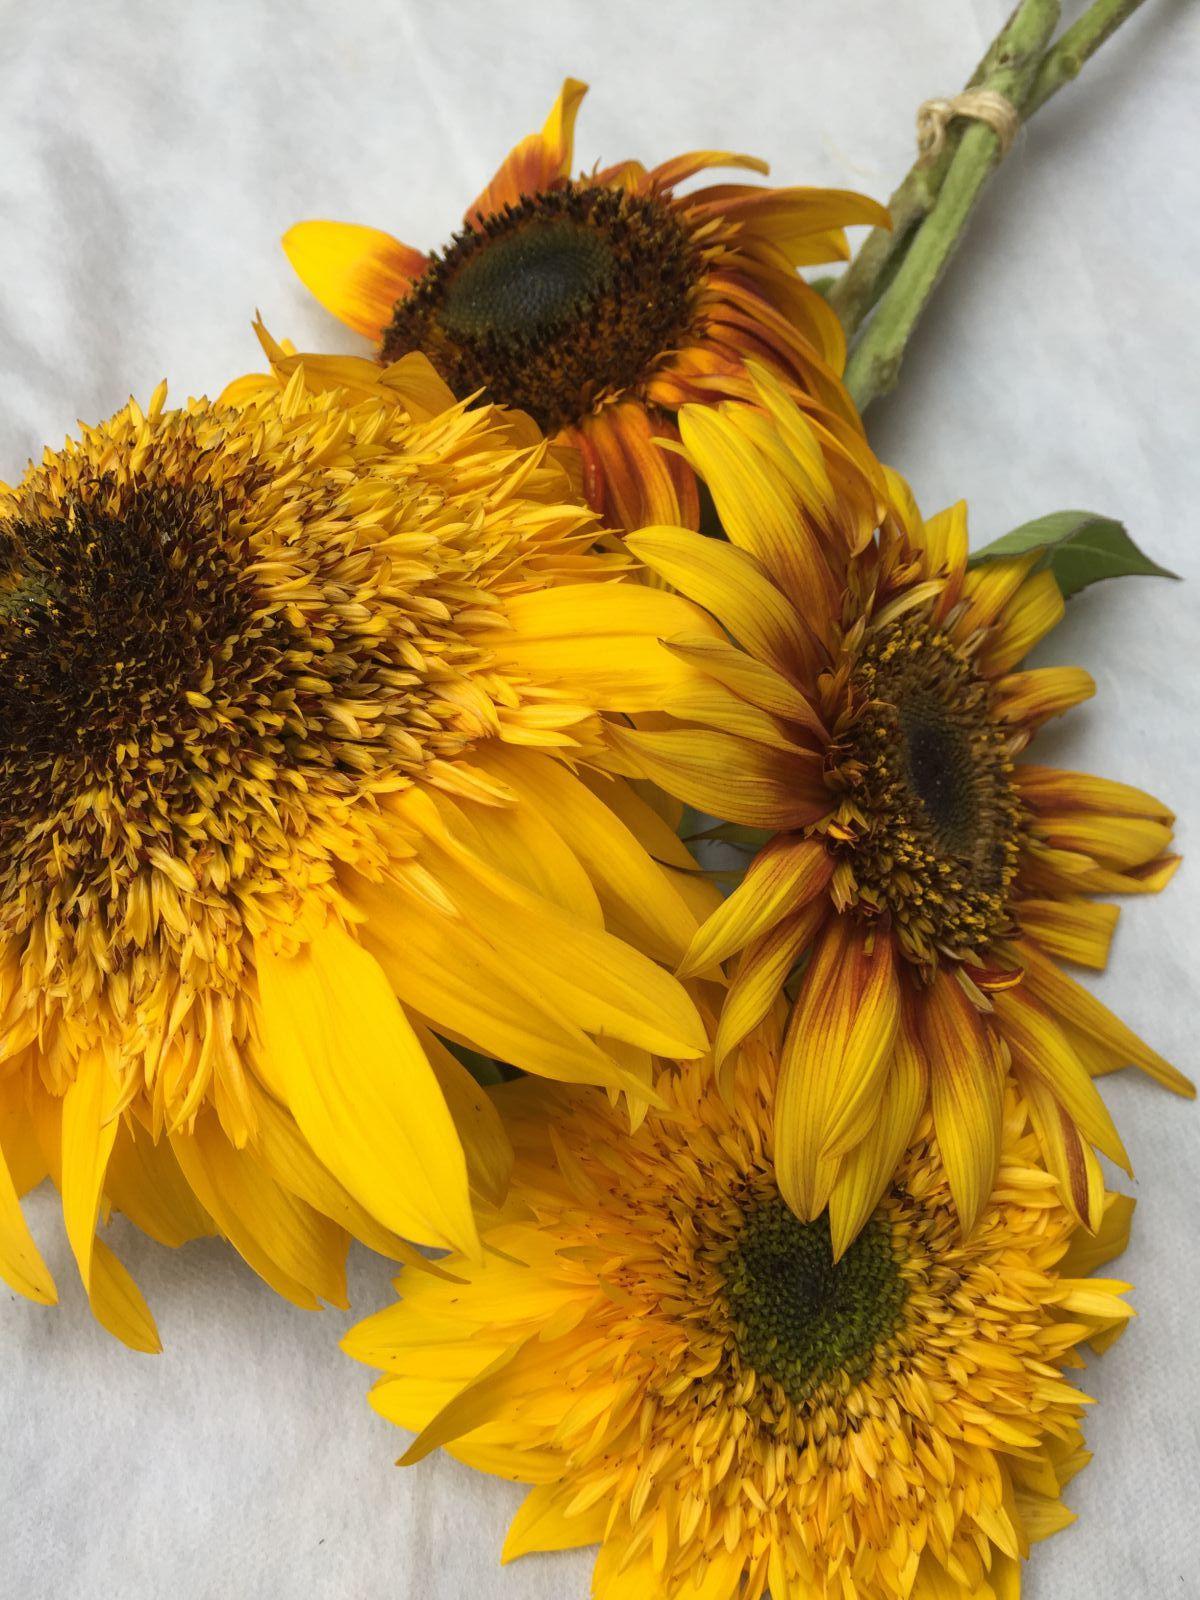 Tiger Teddy Sunflower